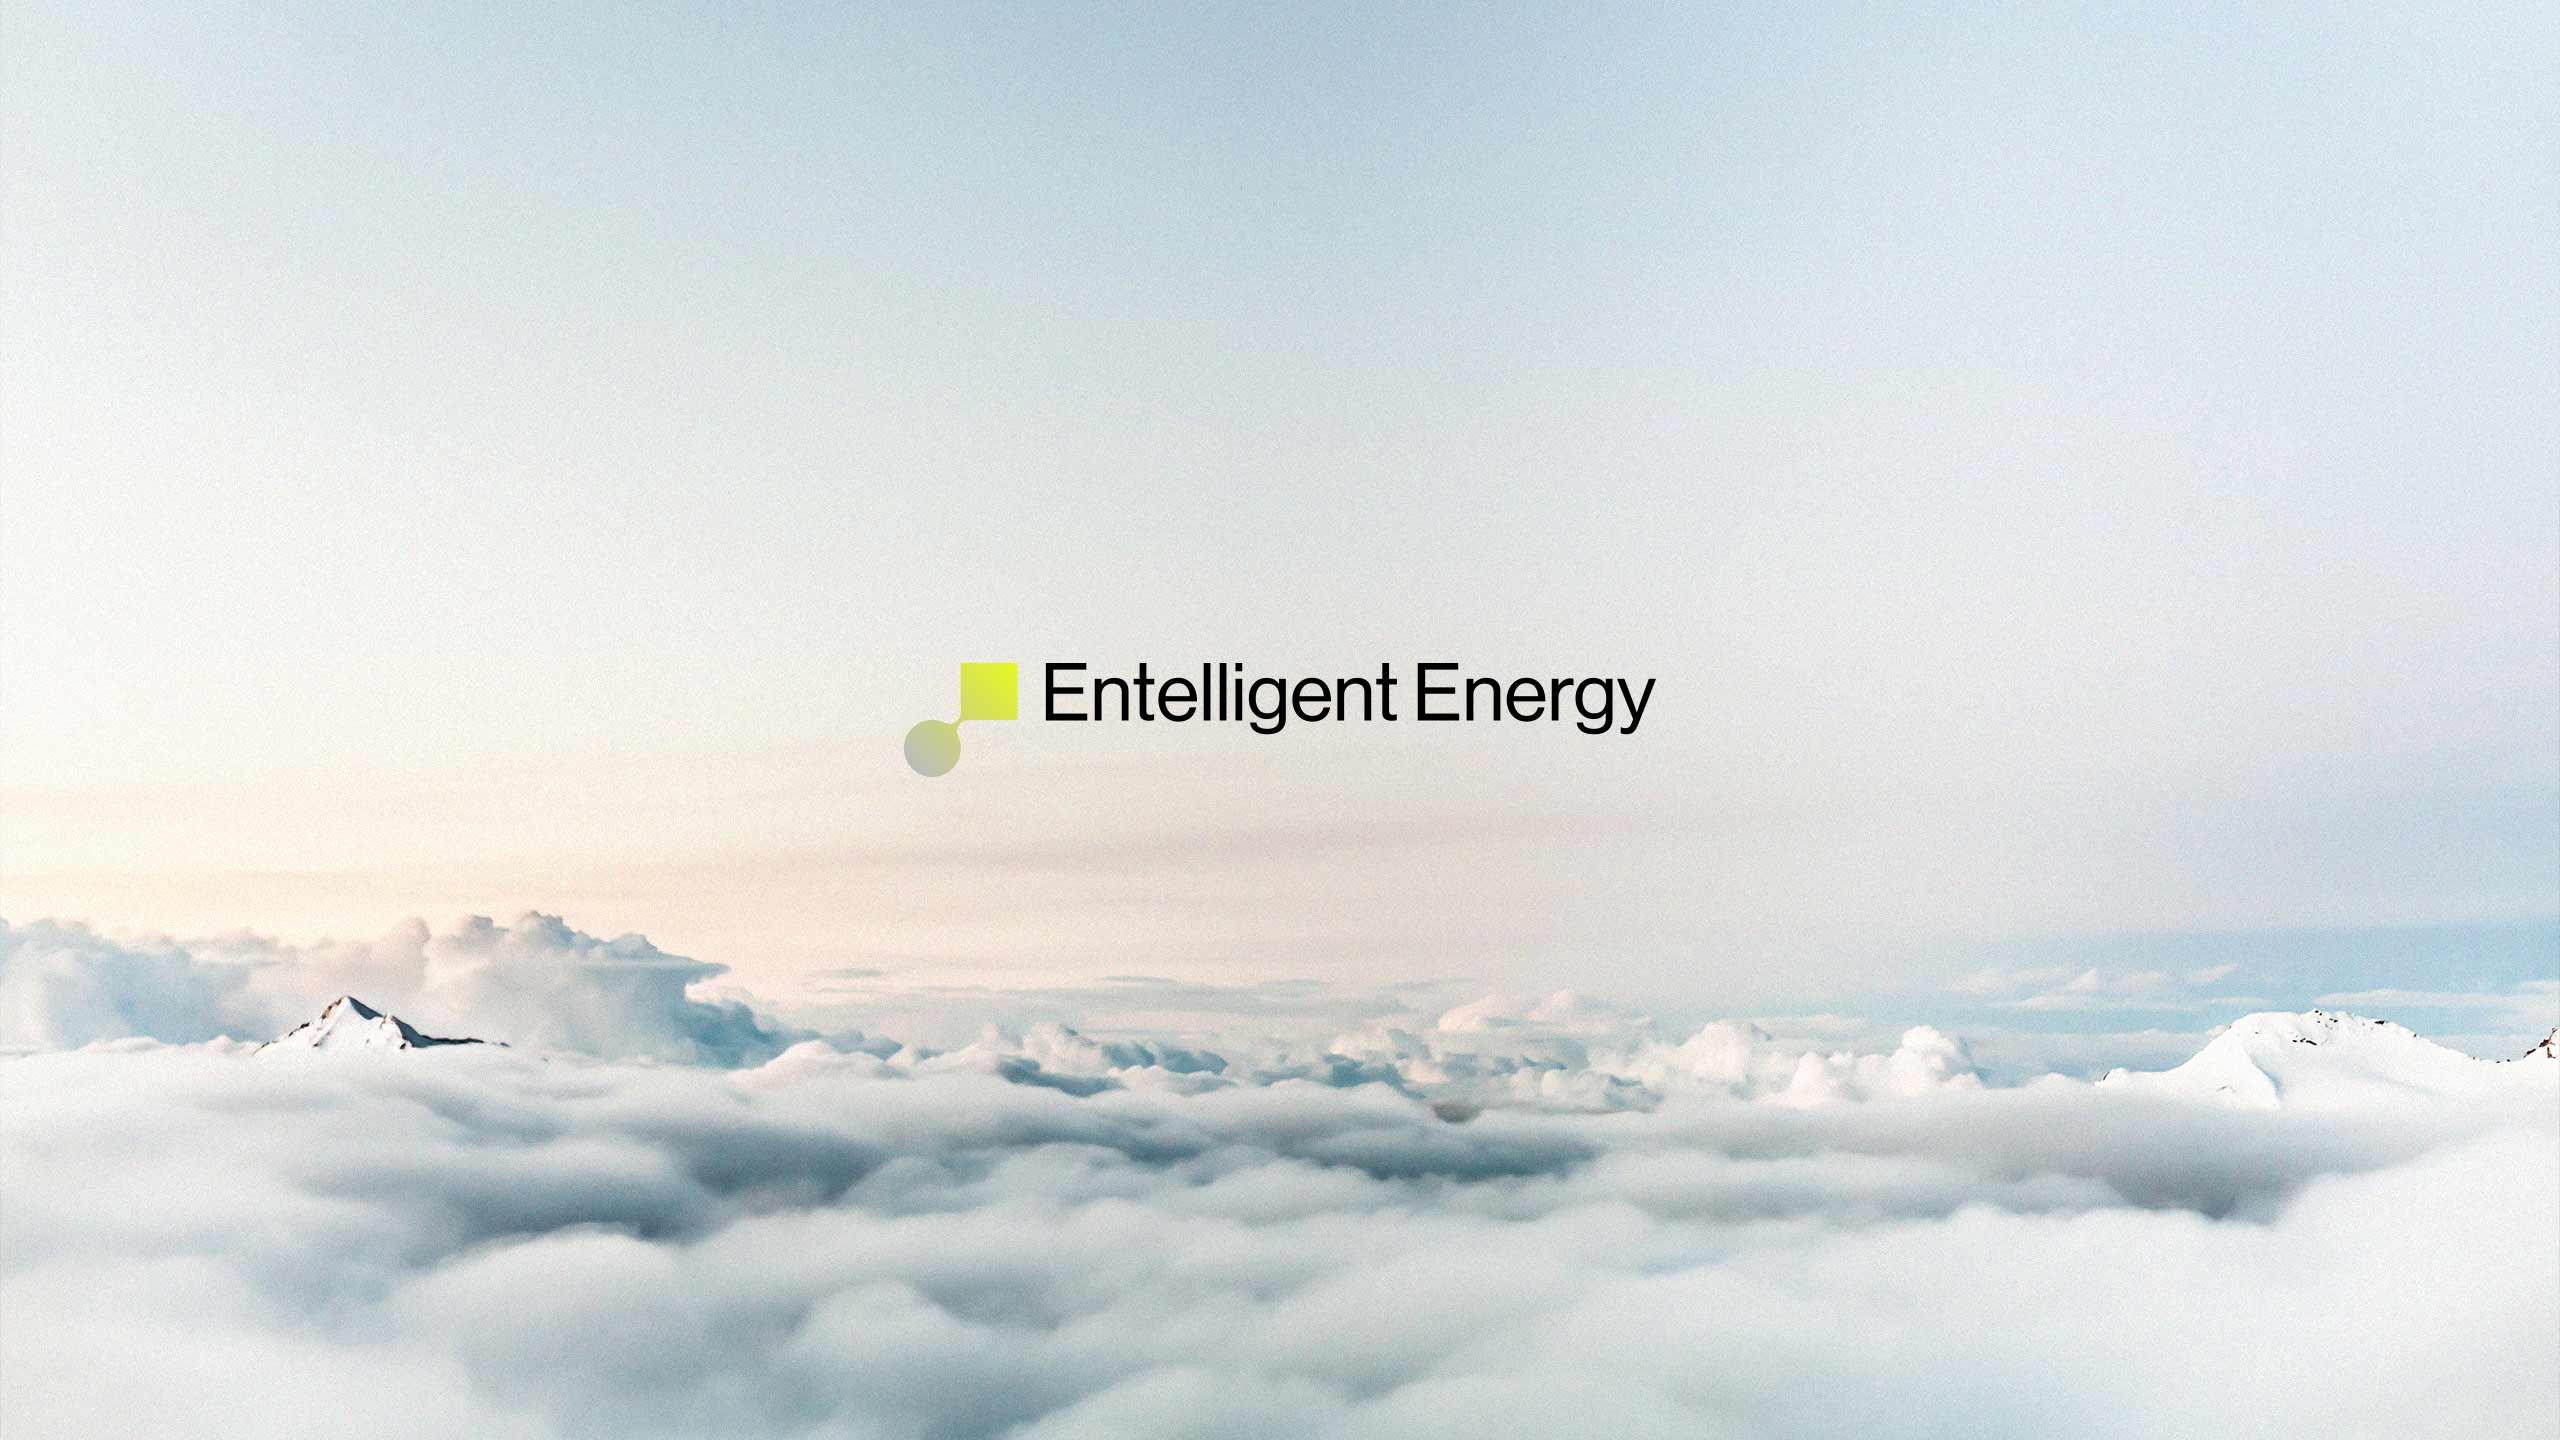 Entelligent-Energy-07c